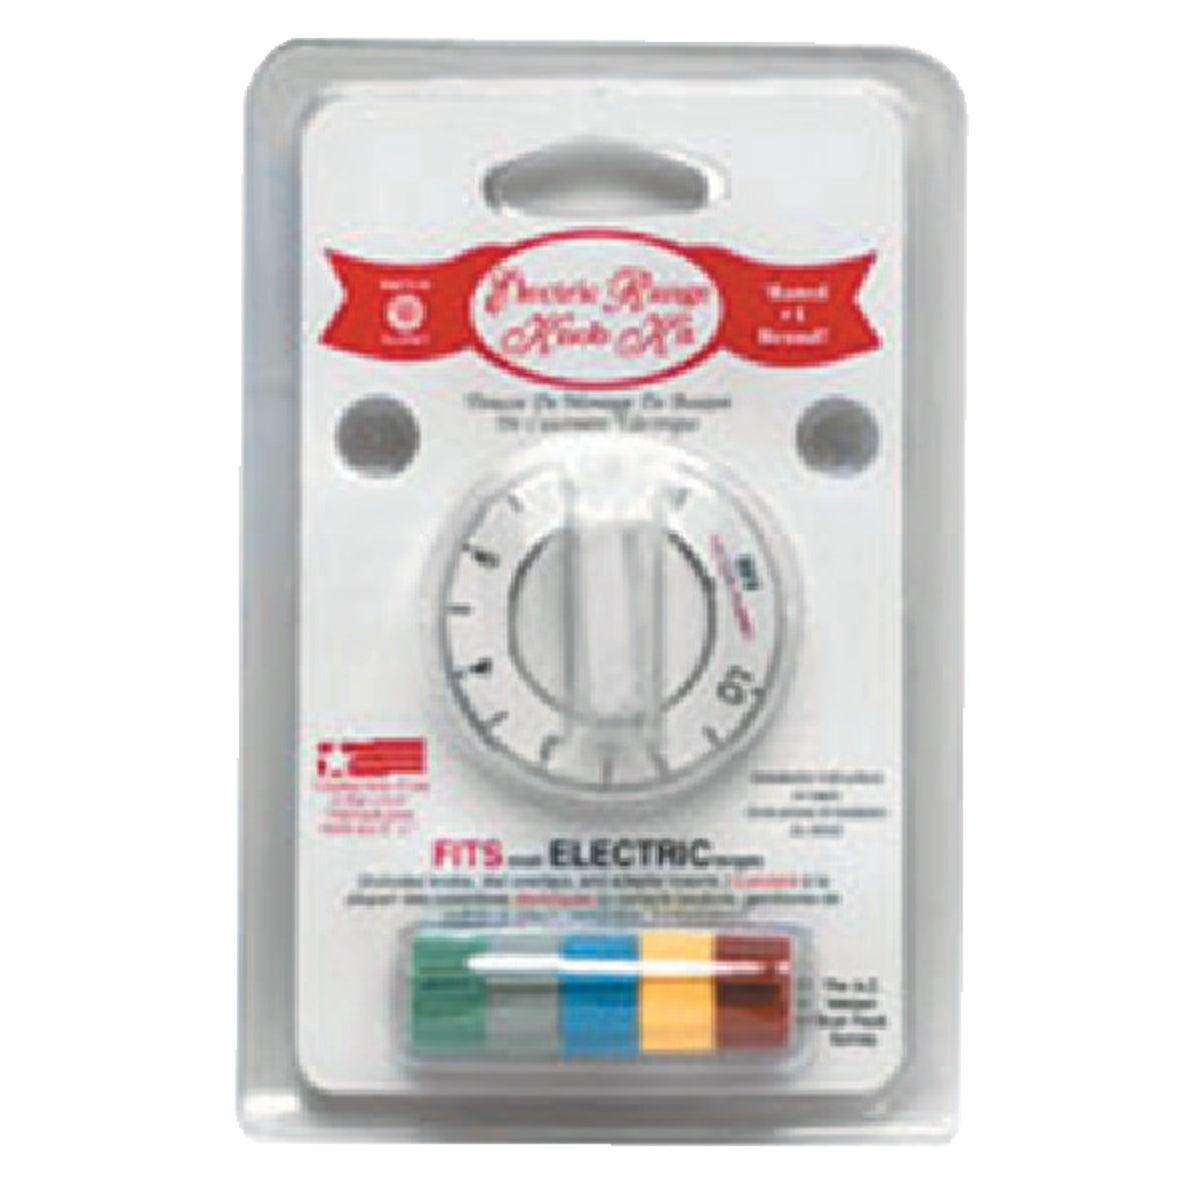 Range Kleen WHITE ELECTRIC KNOB KIT 8131